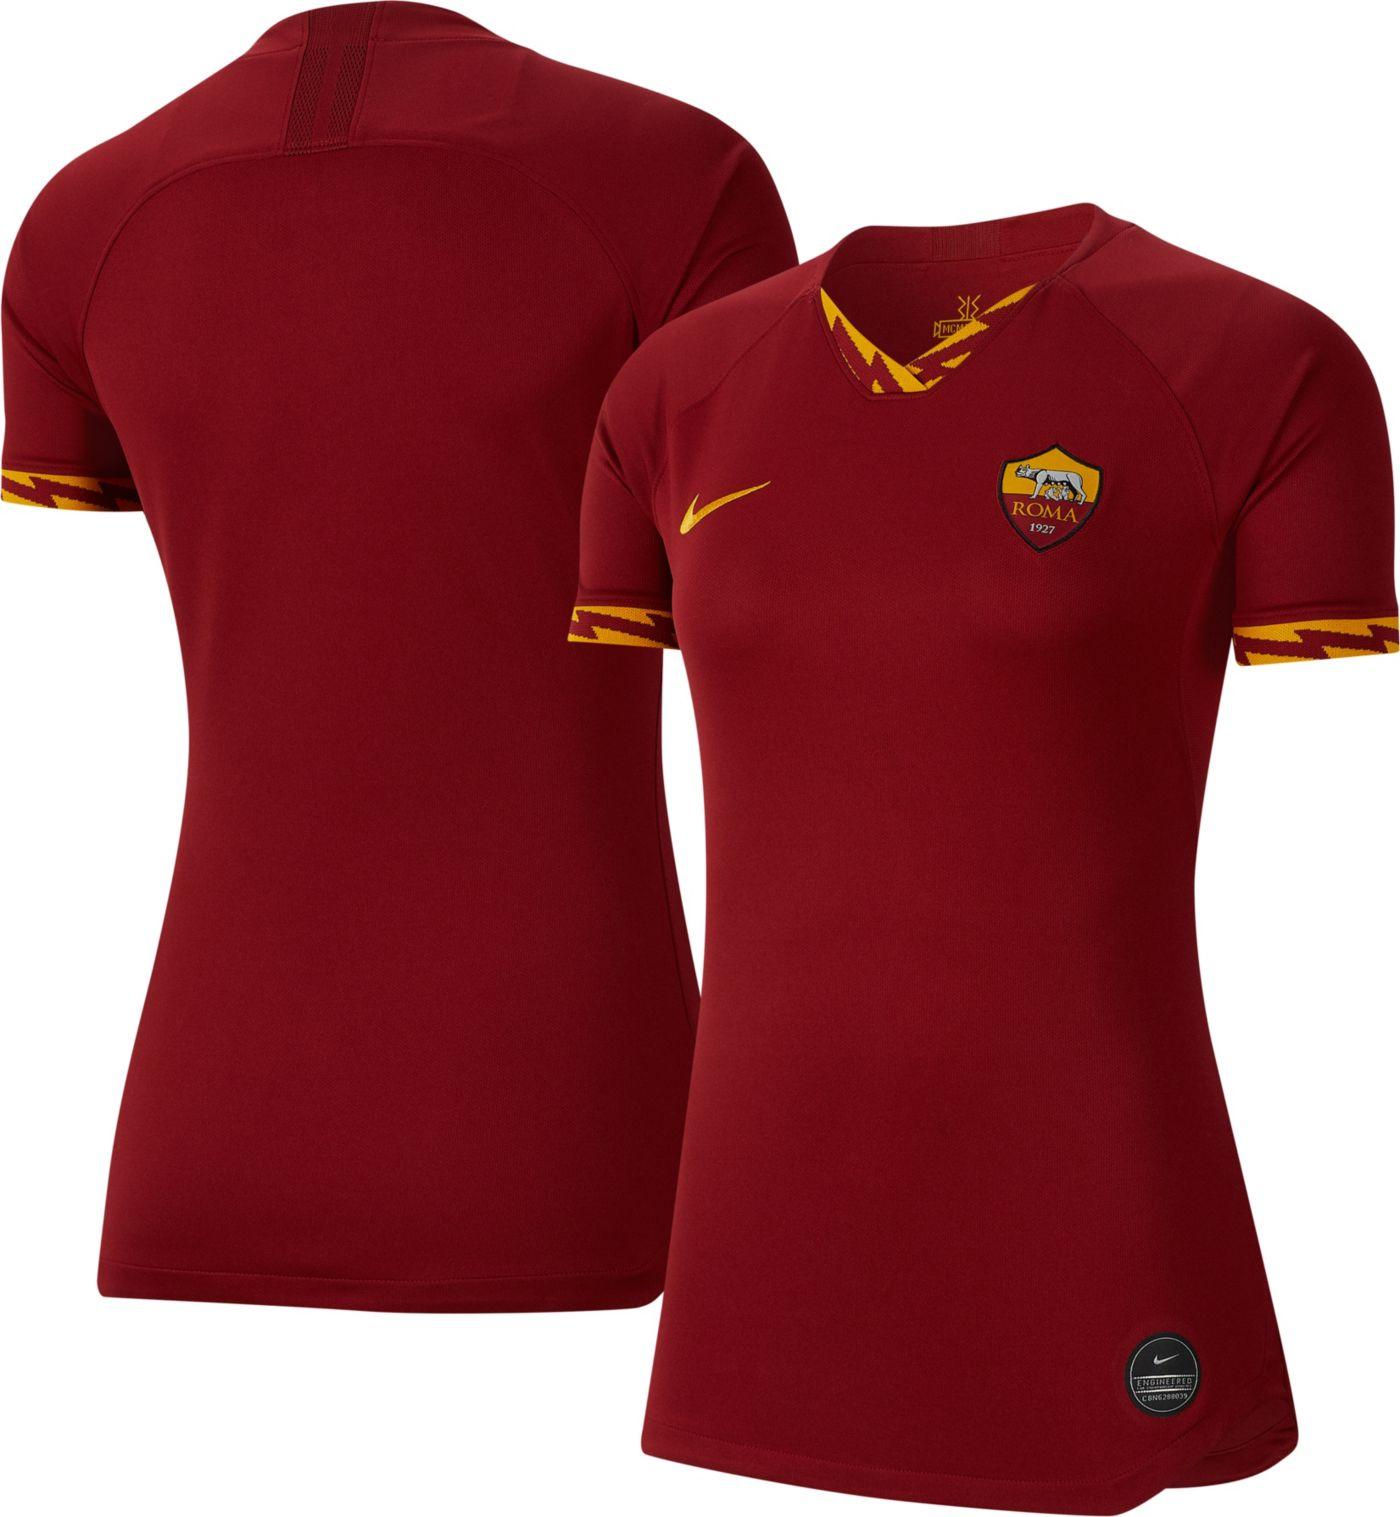 Nike Women's AS Roma '19 Breathe Stadium Home Replica Jersey